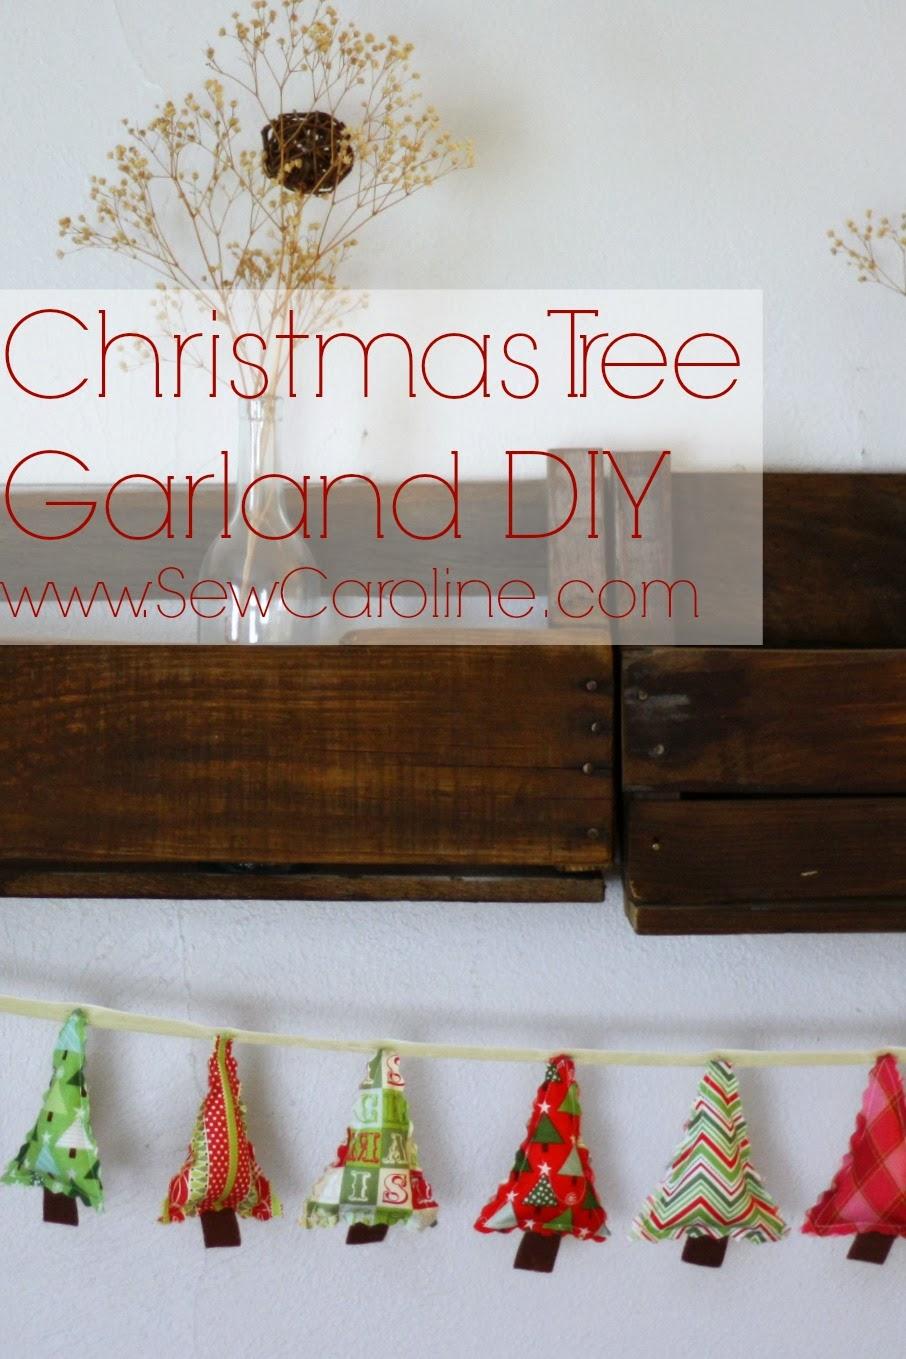 christmas tree garland - Christmas Tree Garland